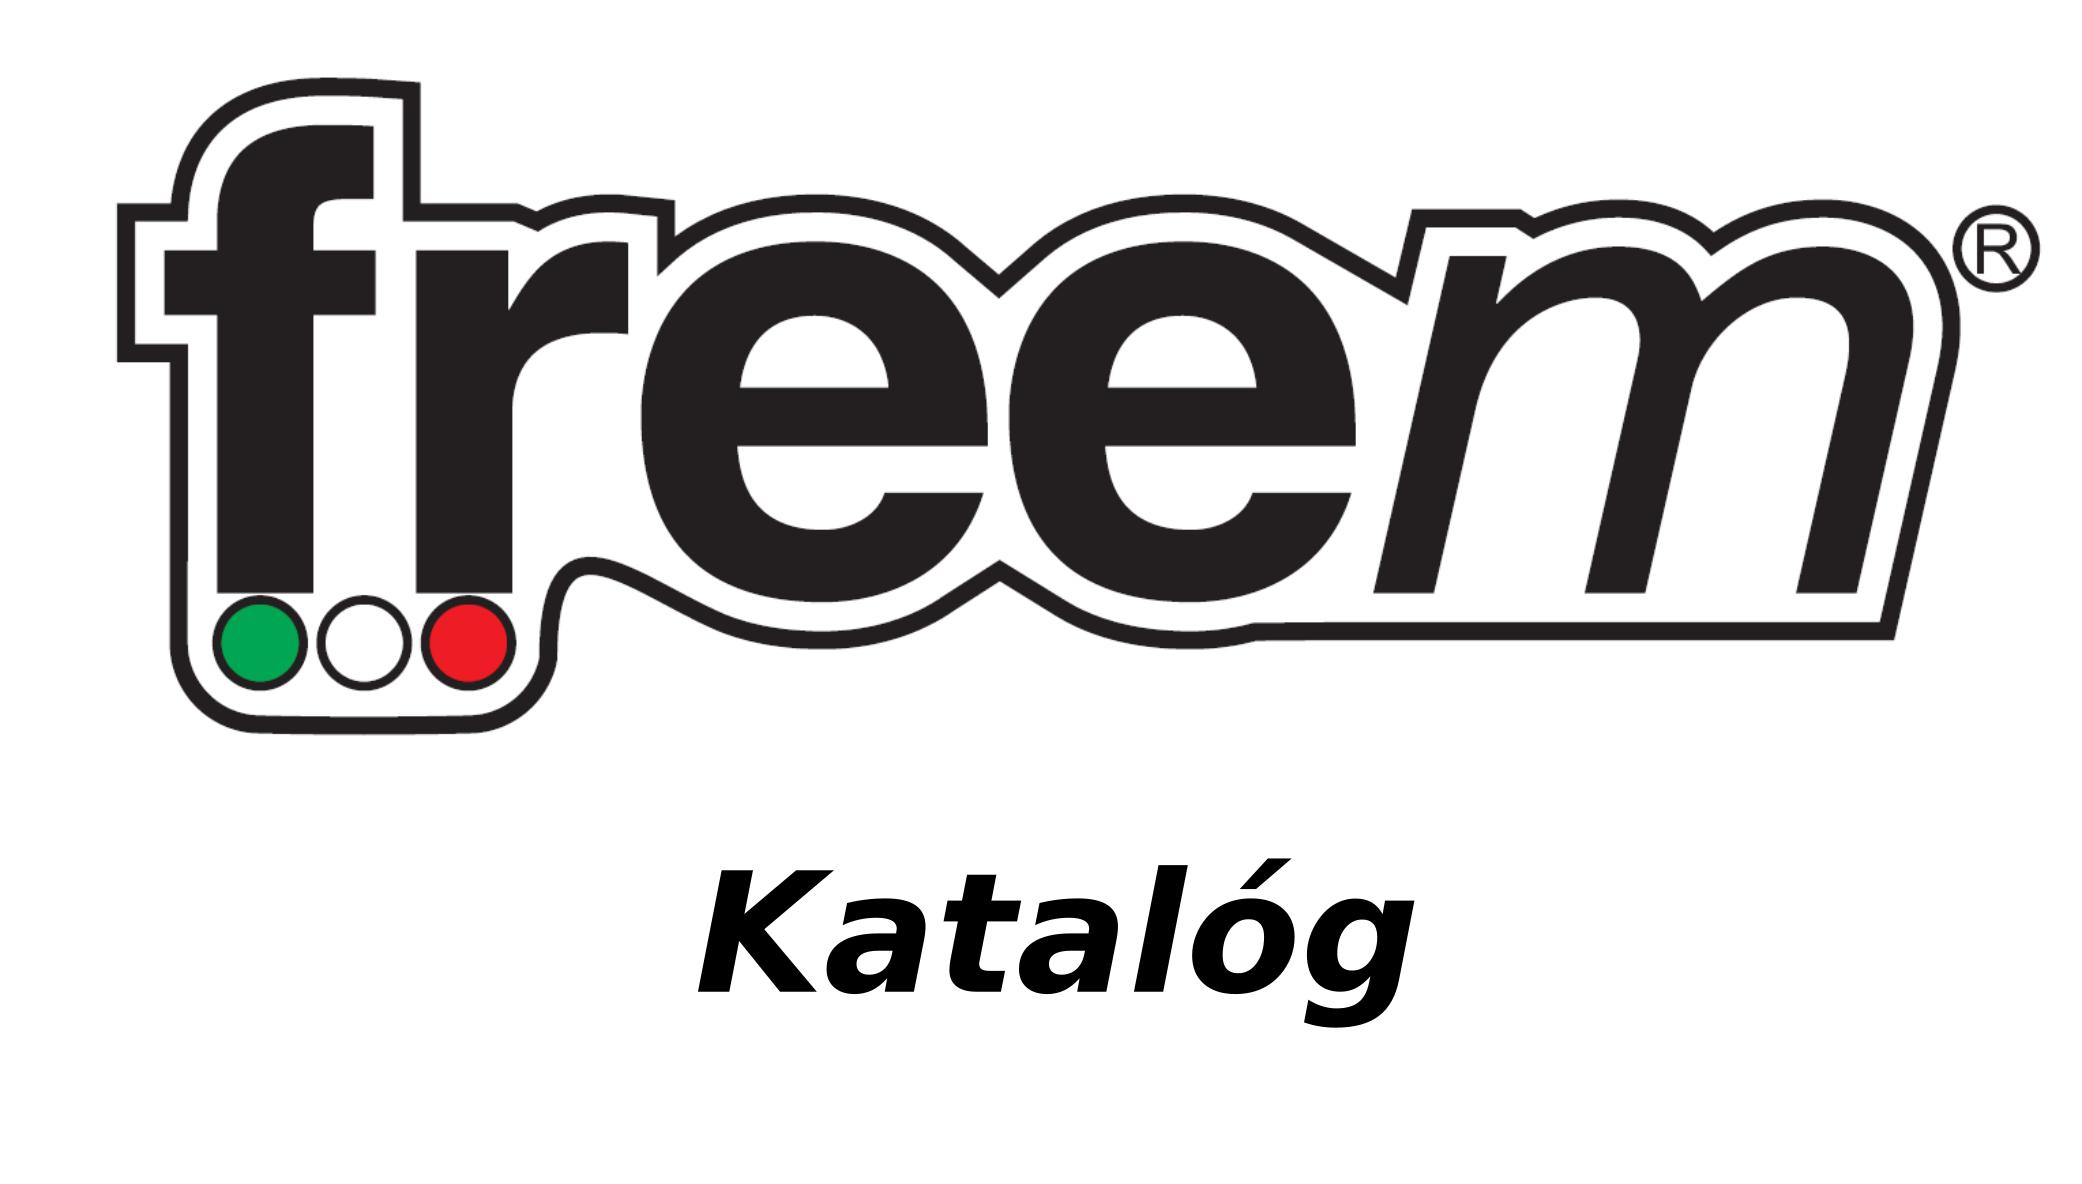 katalog-picture-link